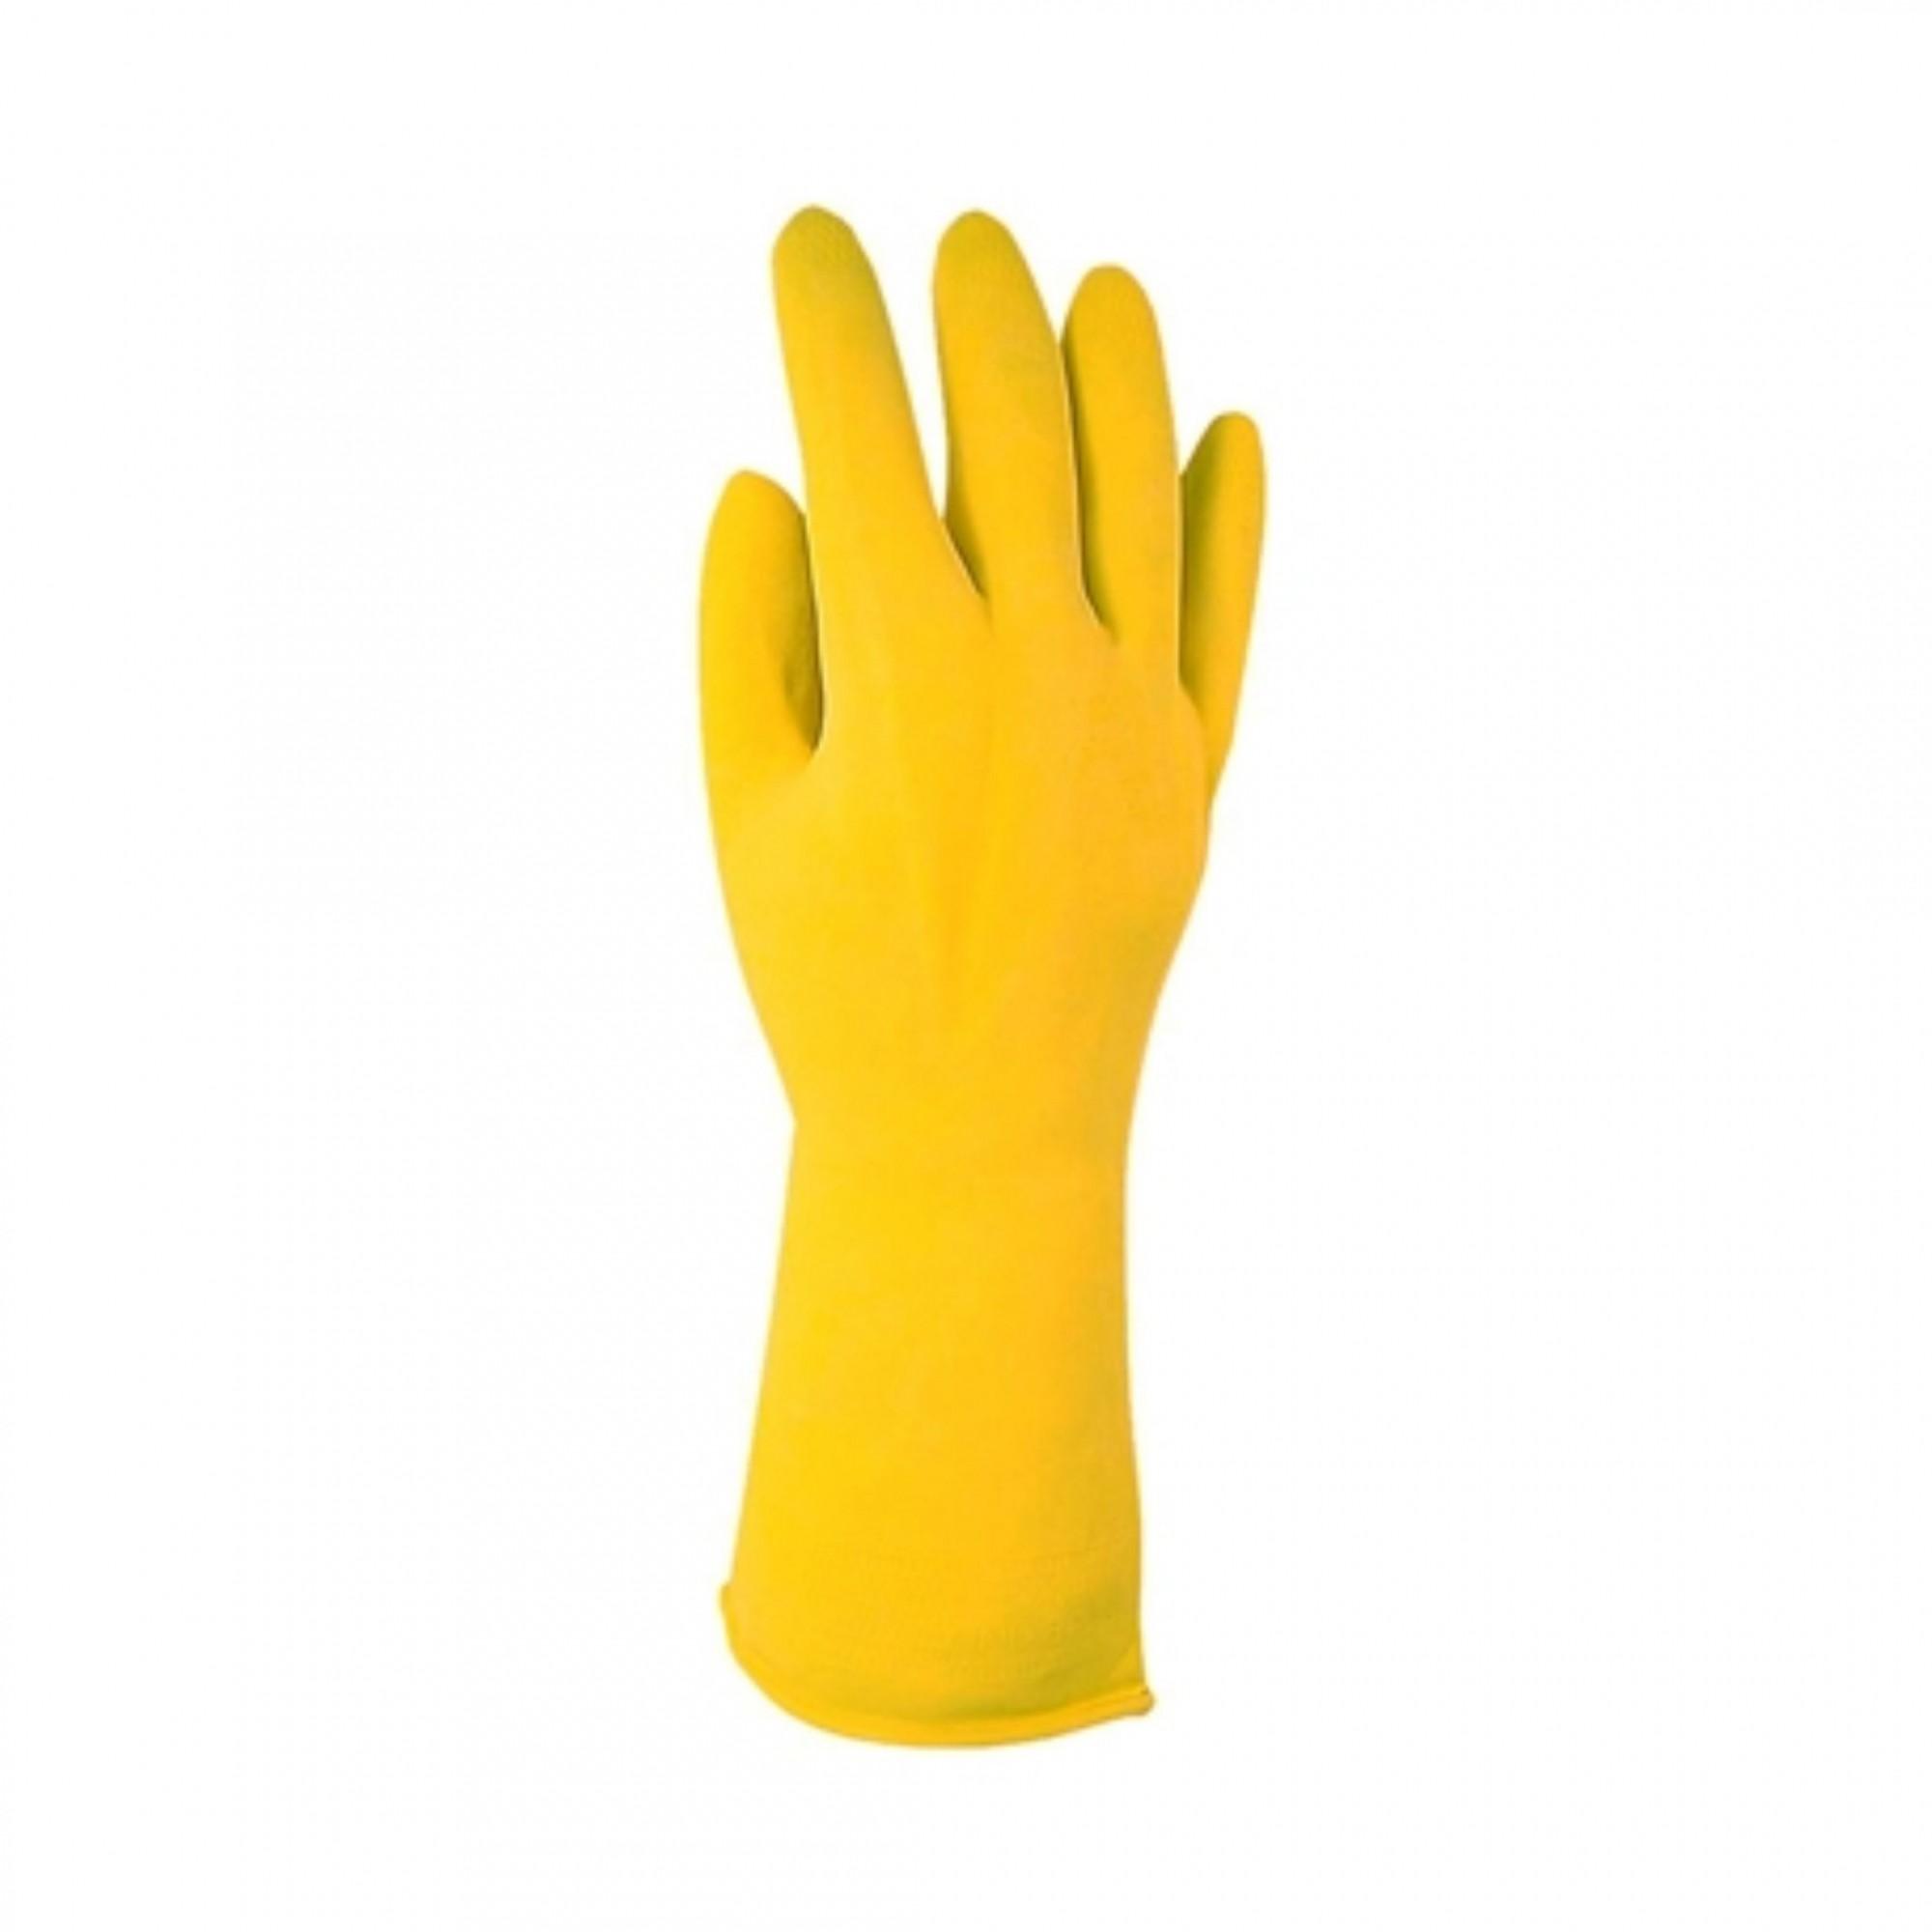 Luva Top Multiuso Para Limpeza Amarela G Sanro